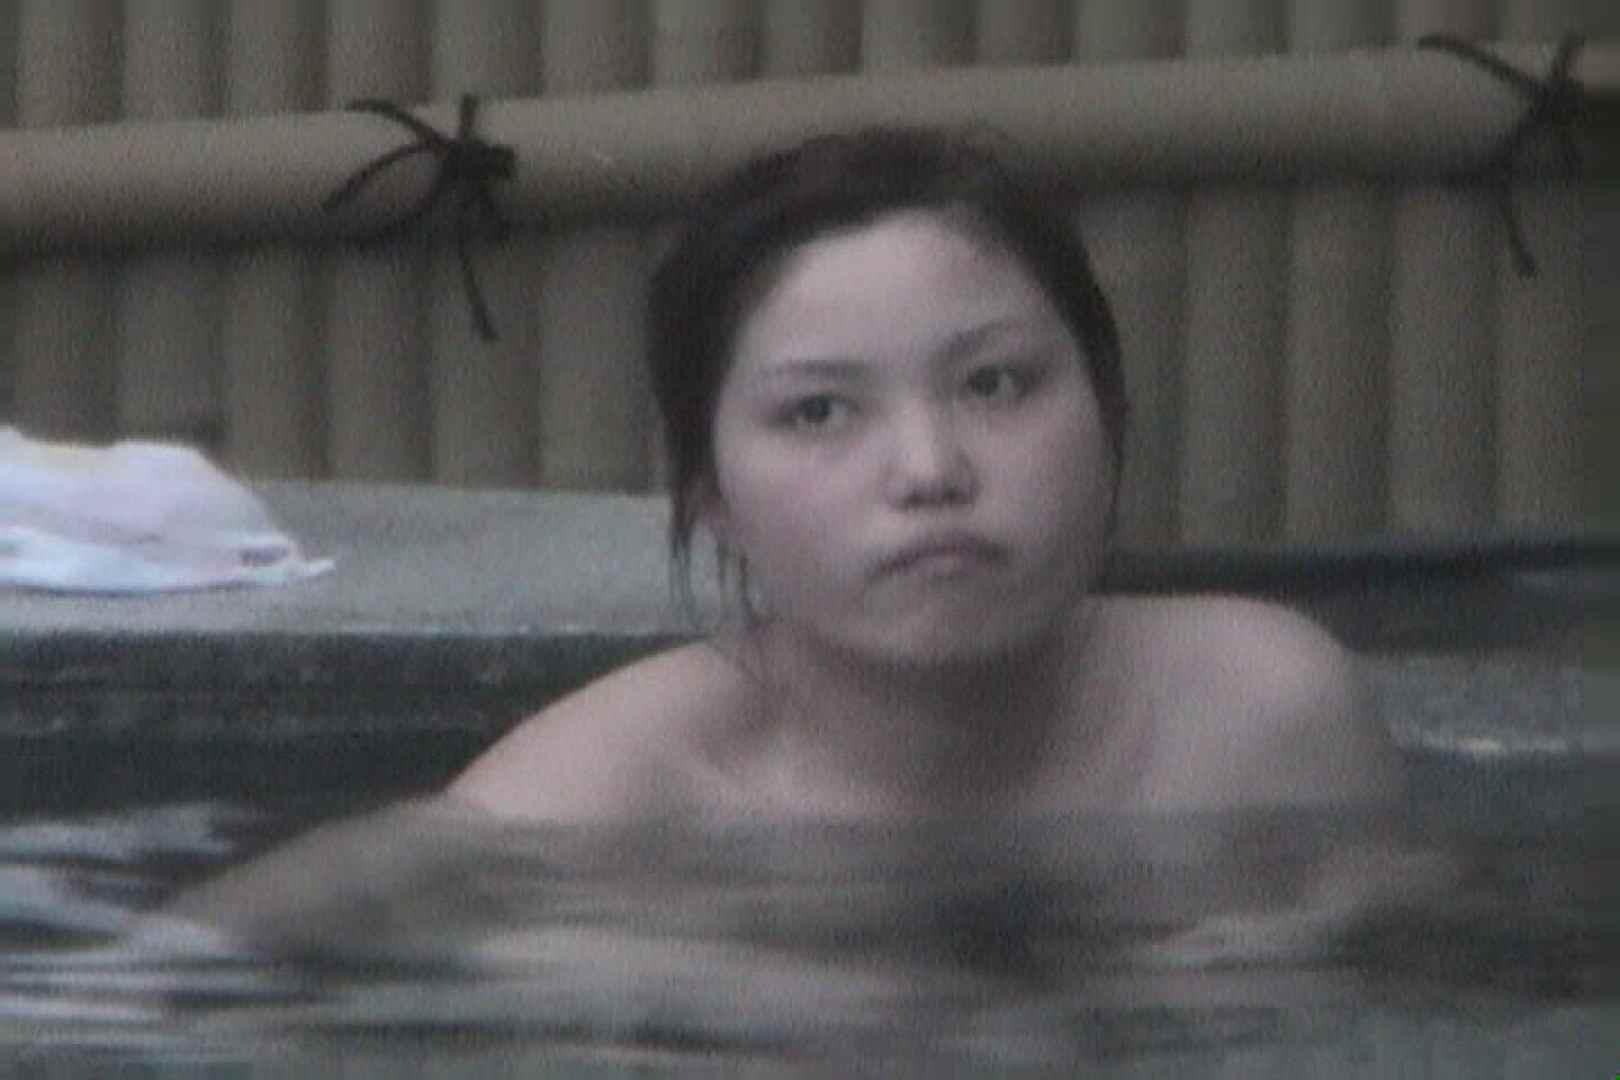 Aquaな露天風呂Vol.602 露天 のぞき動画キャプチャ 110pic 79